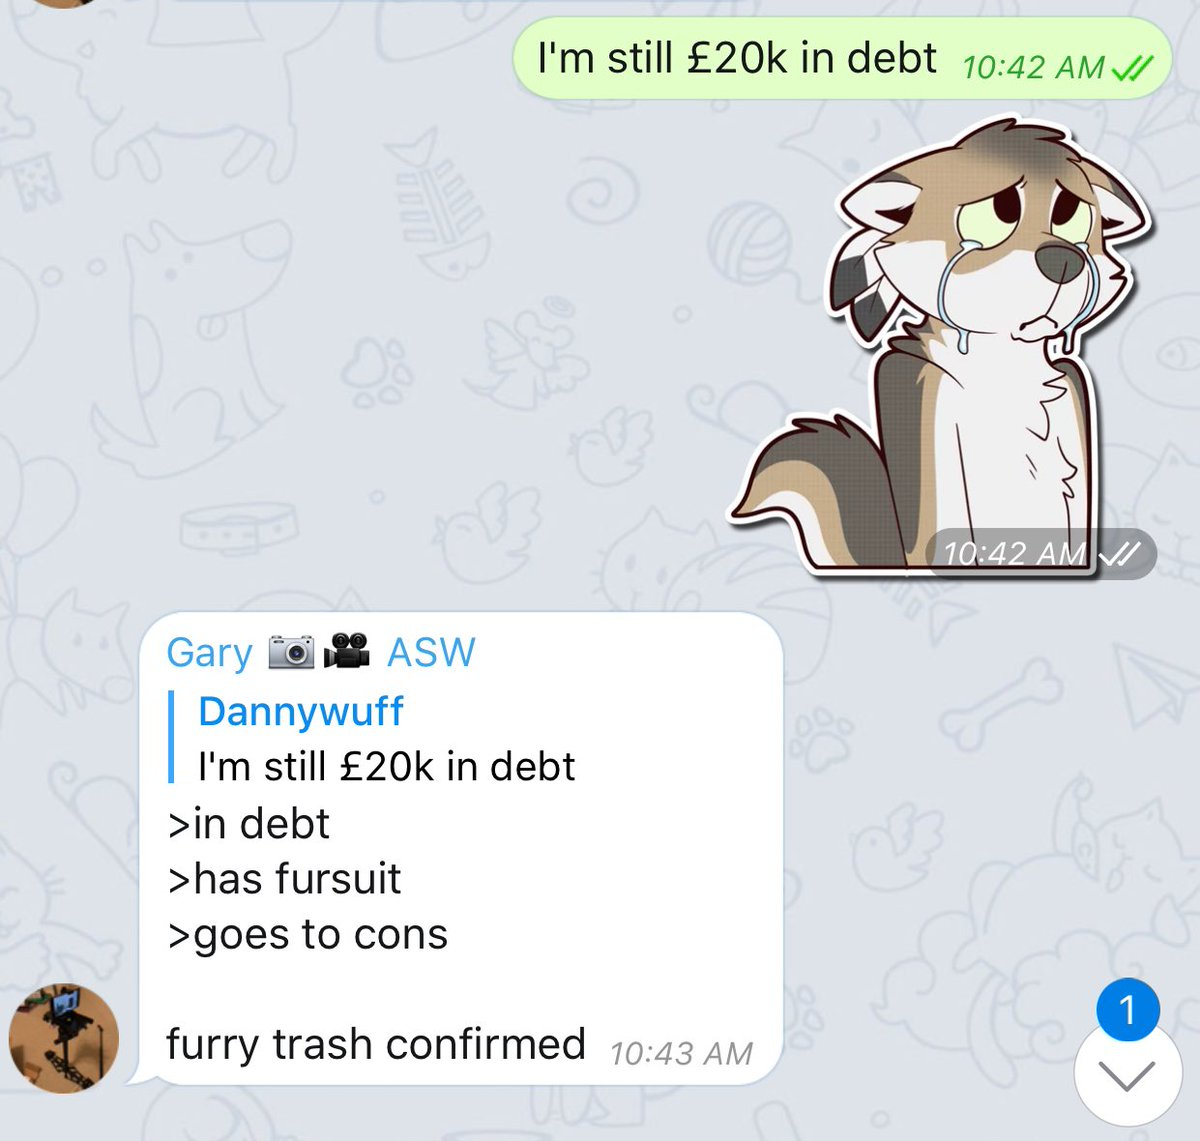 According to @ArcticSkyWolf I'm furry trash thanks to student finance xD ;-; https://t.co/Uspm6gReFi